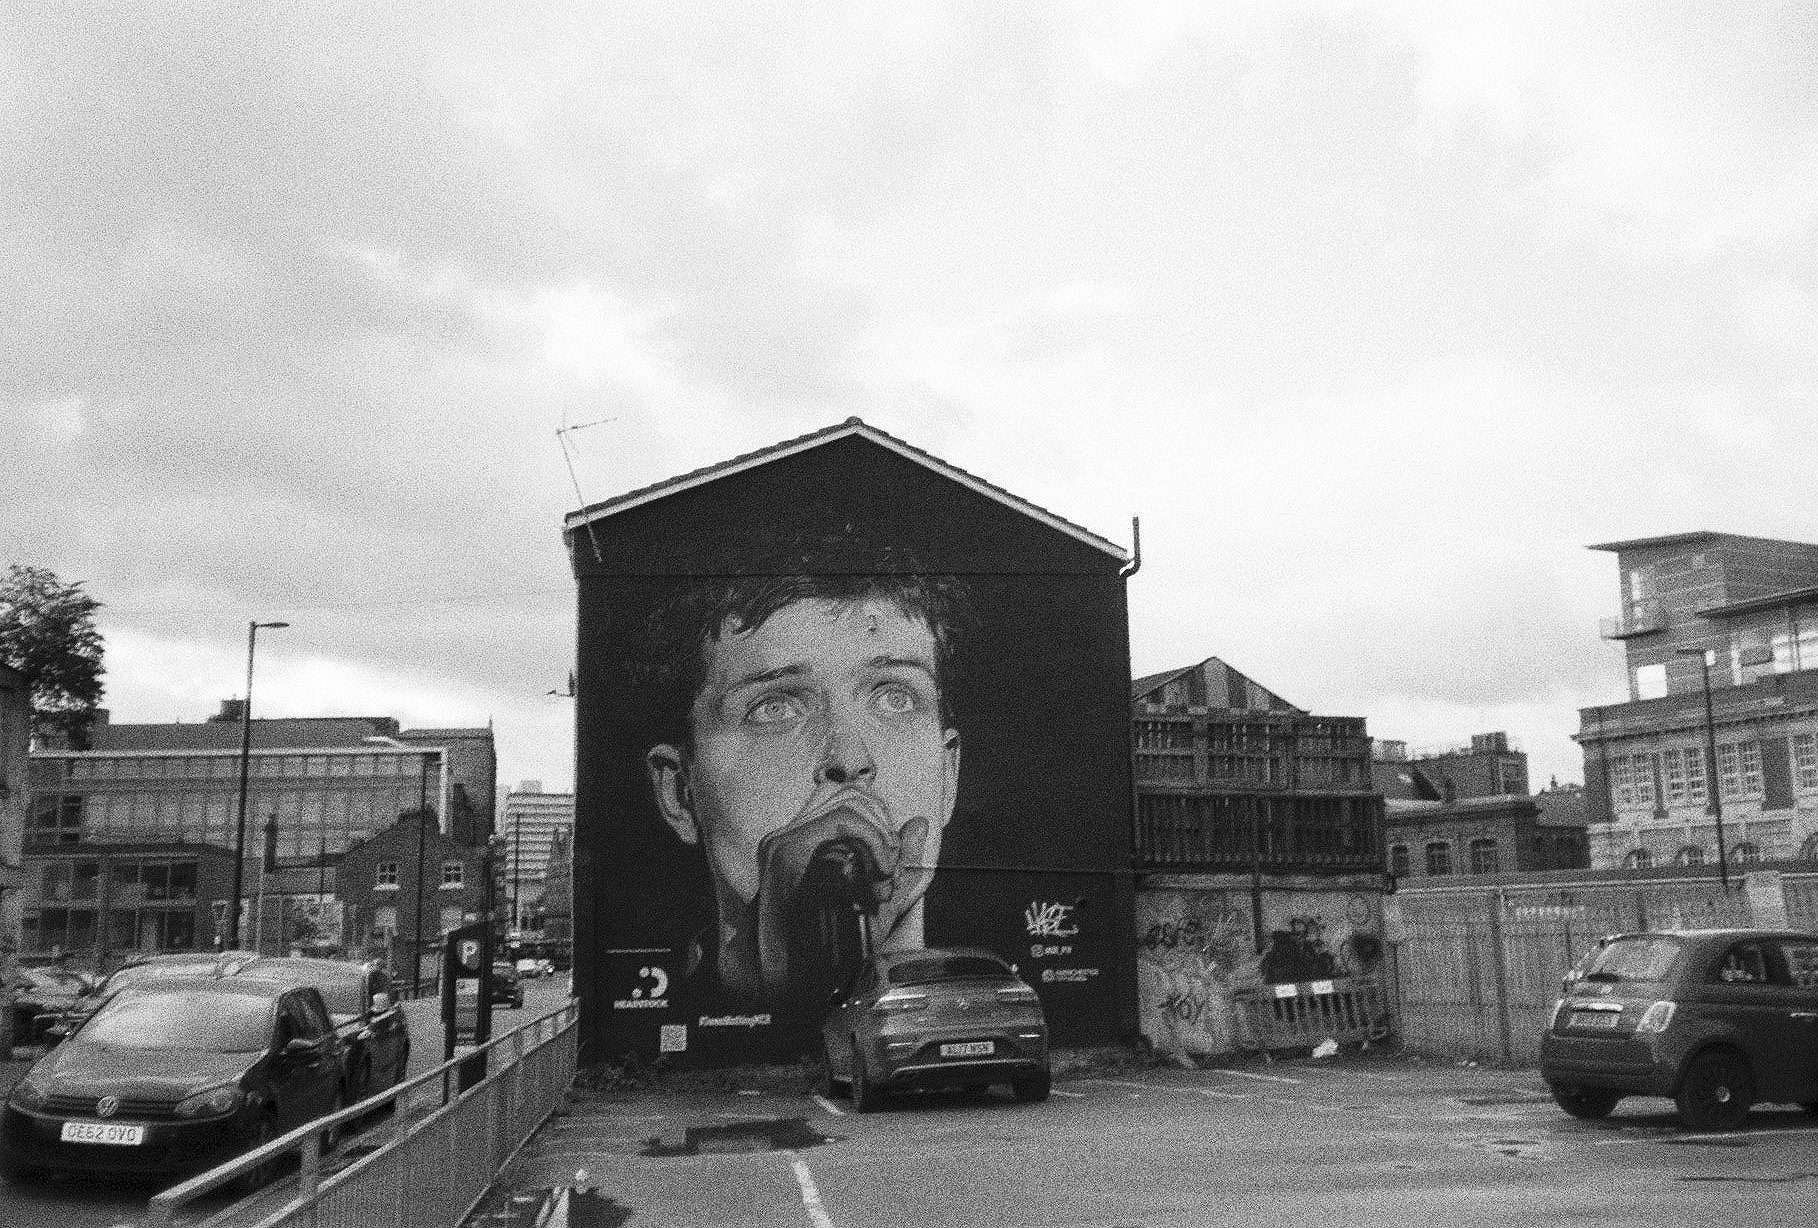 2. Ian Curtis Mural (@akse_p19), Northern Quarter – HP5 Plus, Canon Sureshot AF7s